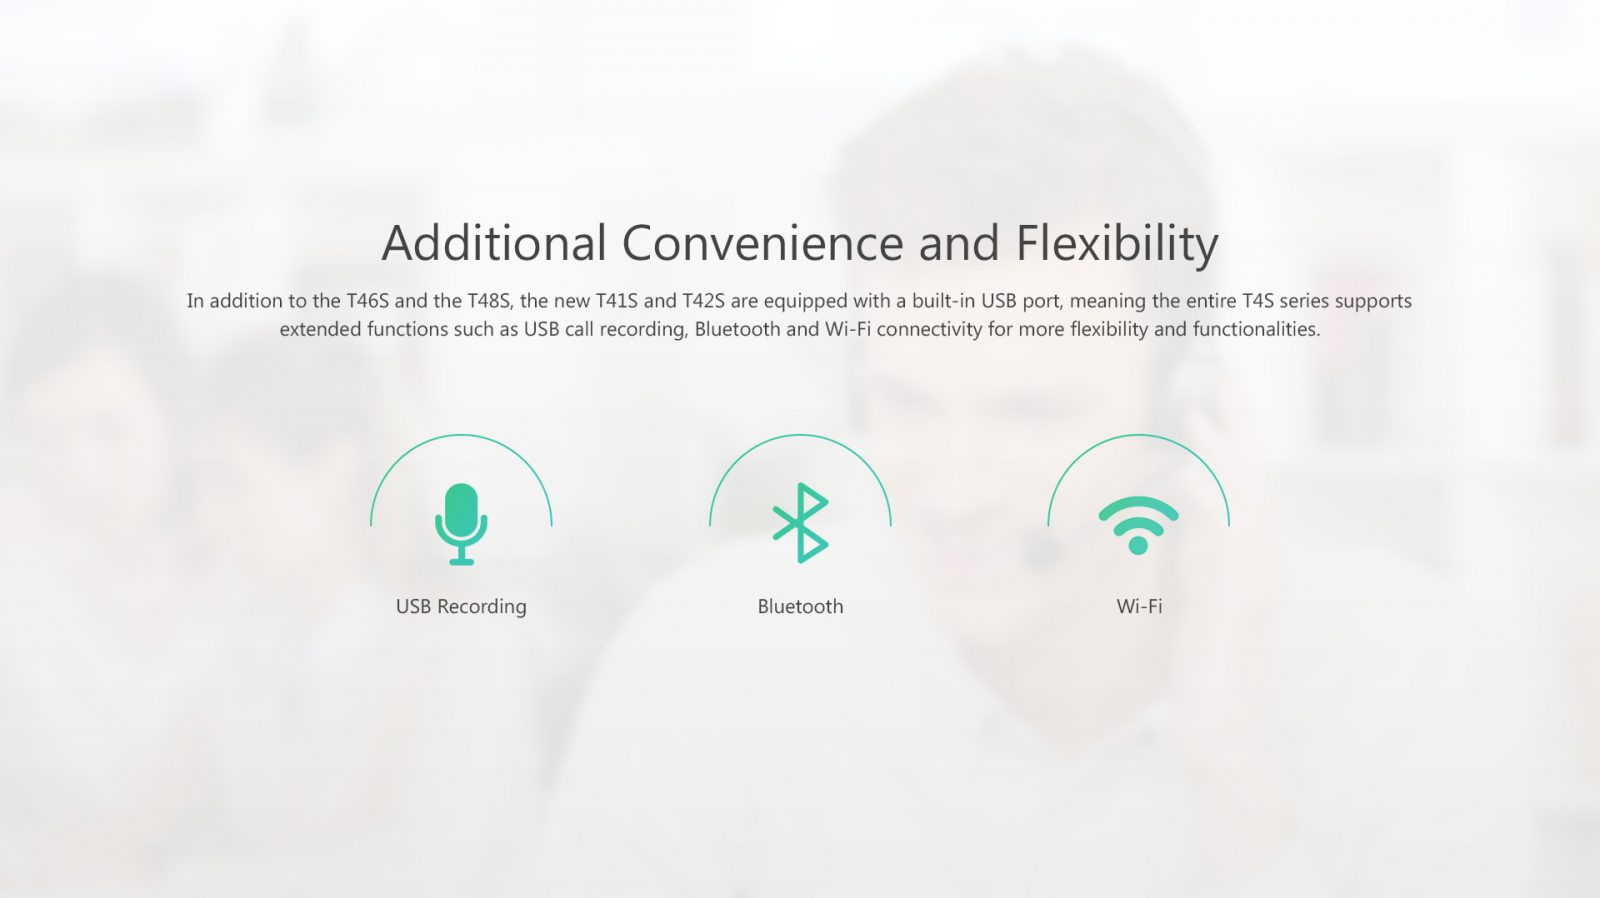 Yealink IP Phone - Hong Kong Hotline: 39001988 - Matrix Technology (HK) Ltd